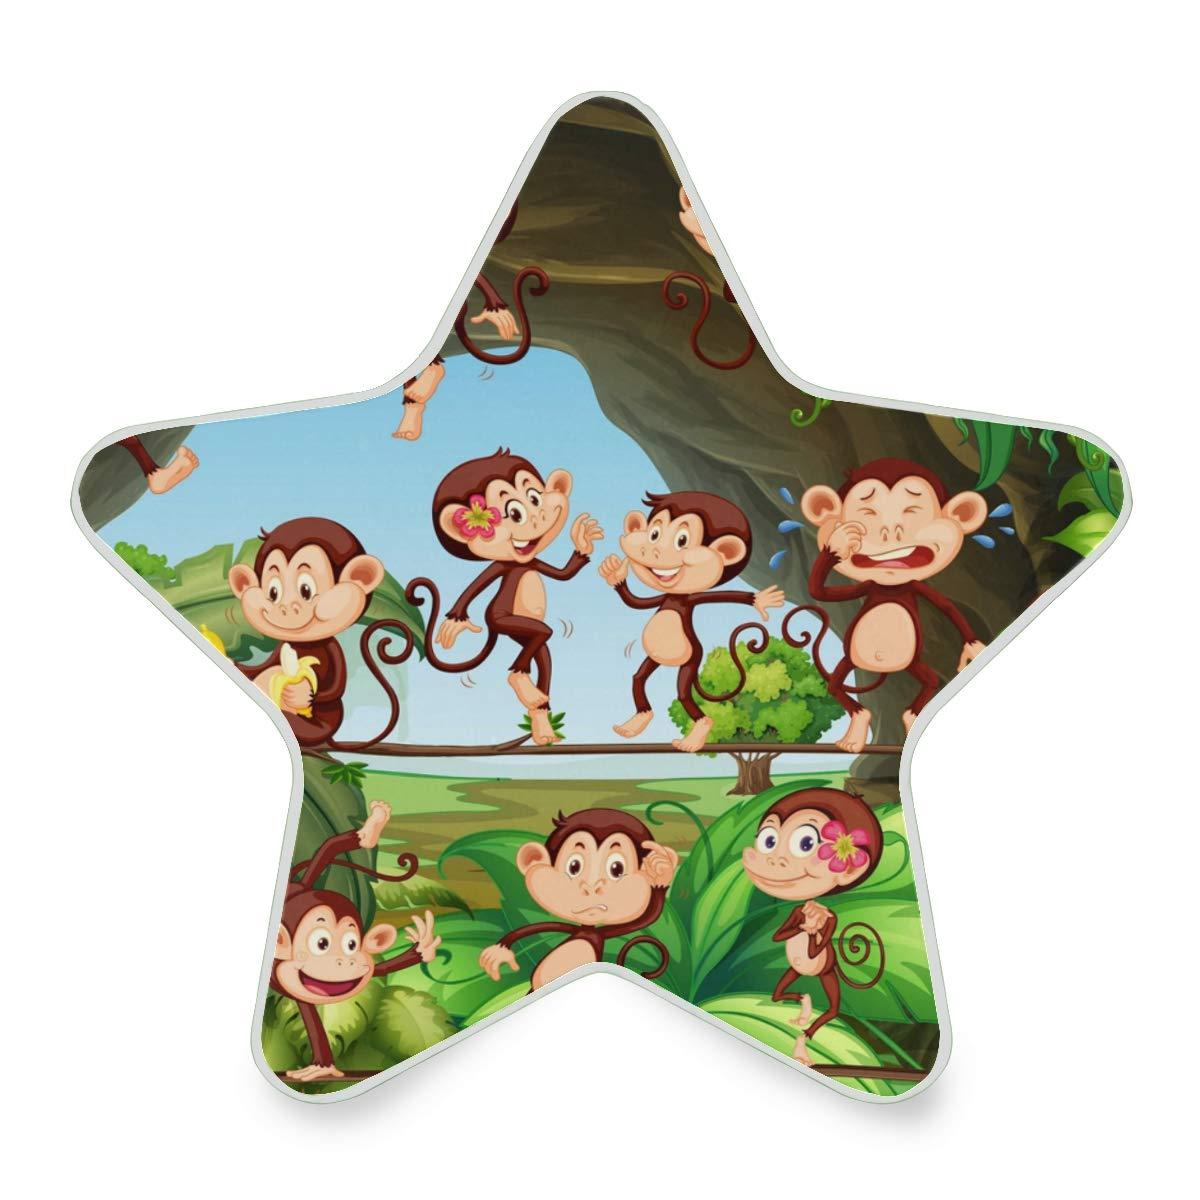 Linomo Star 5 New Free Shipping ☆ popular Shaped LED Night Light Animal Cute Auto Lamp Monkey